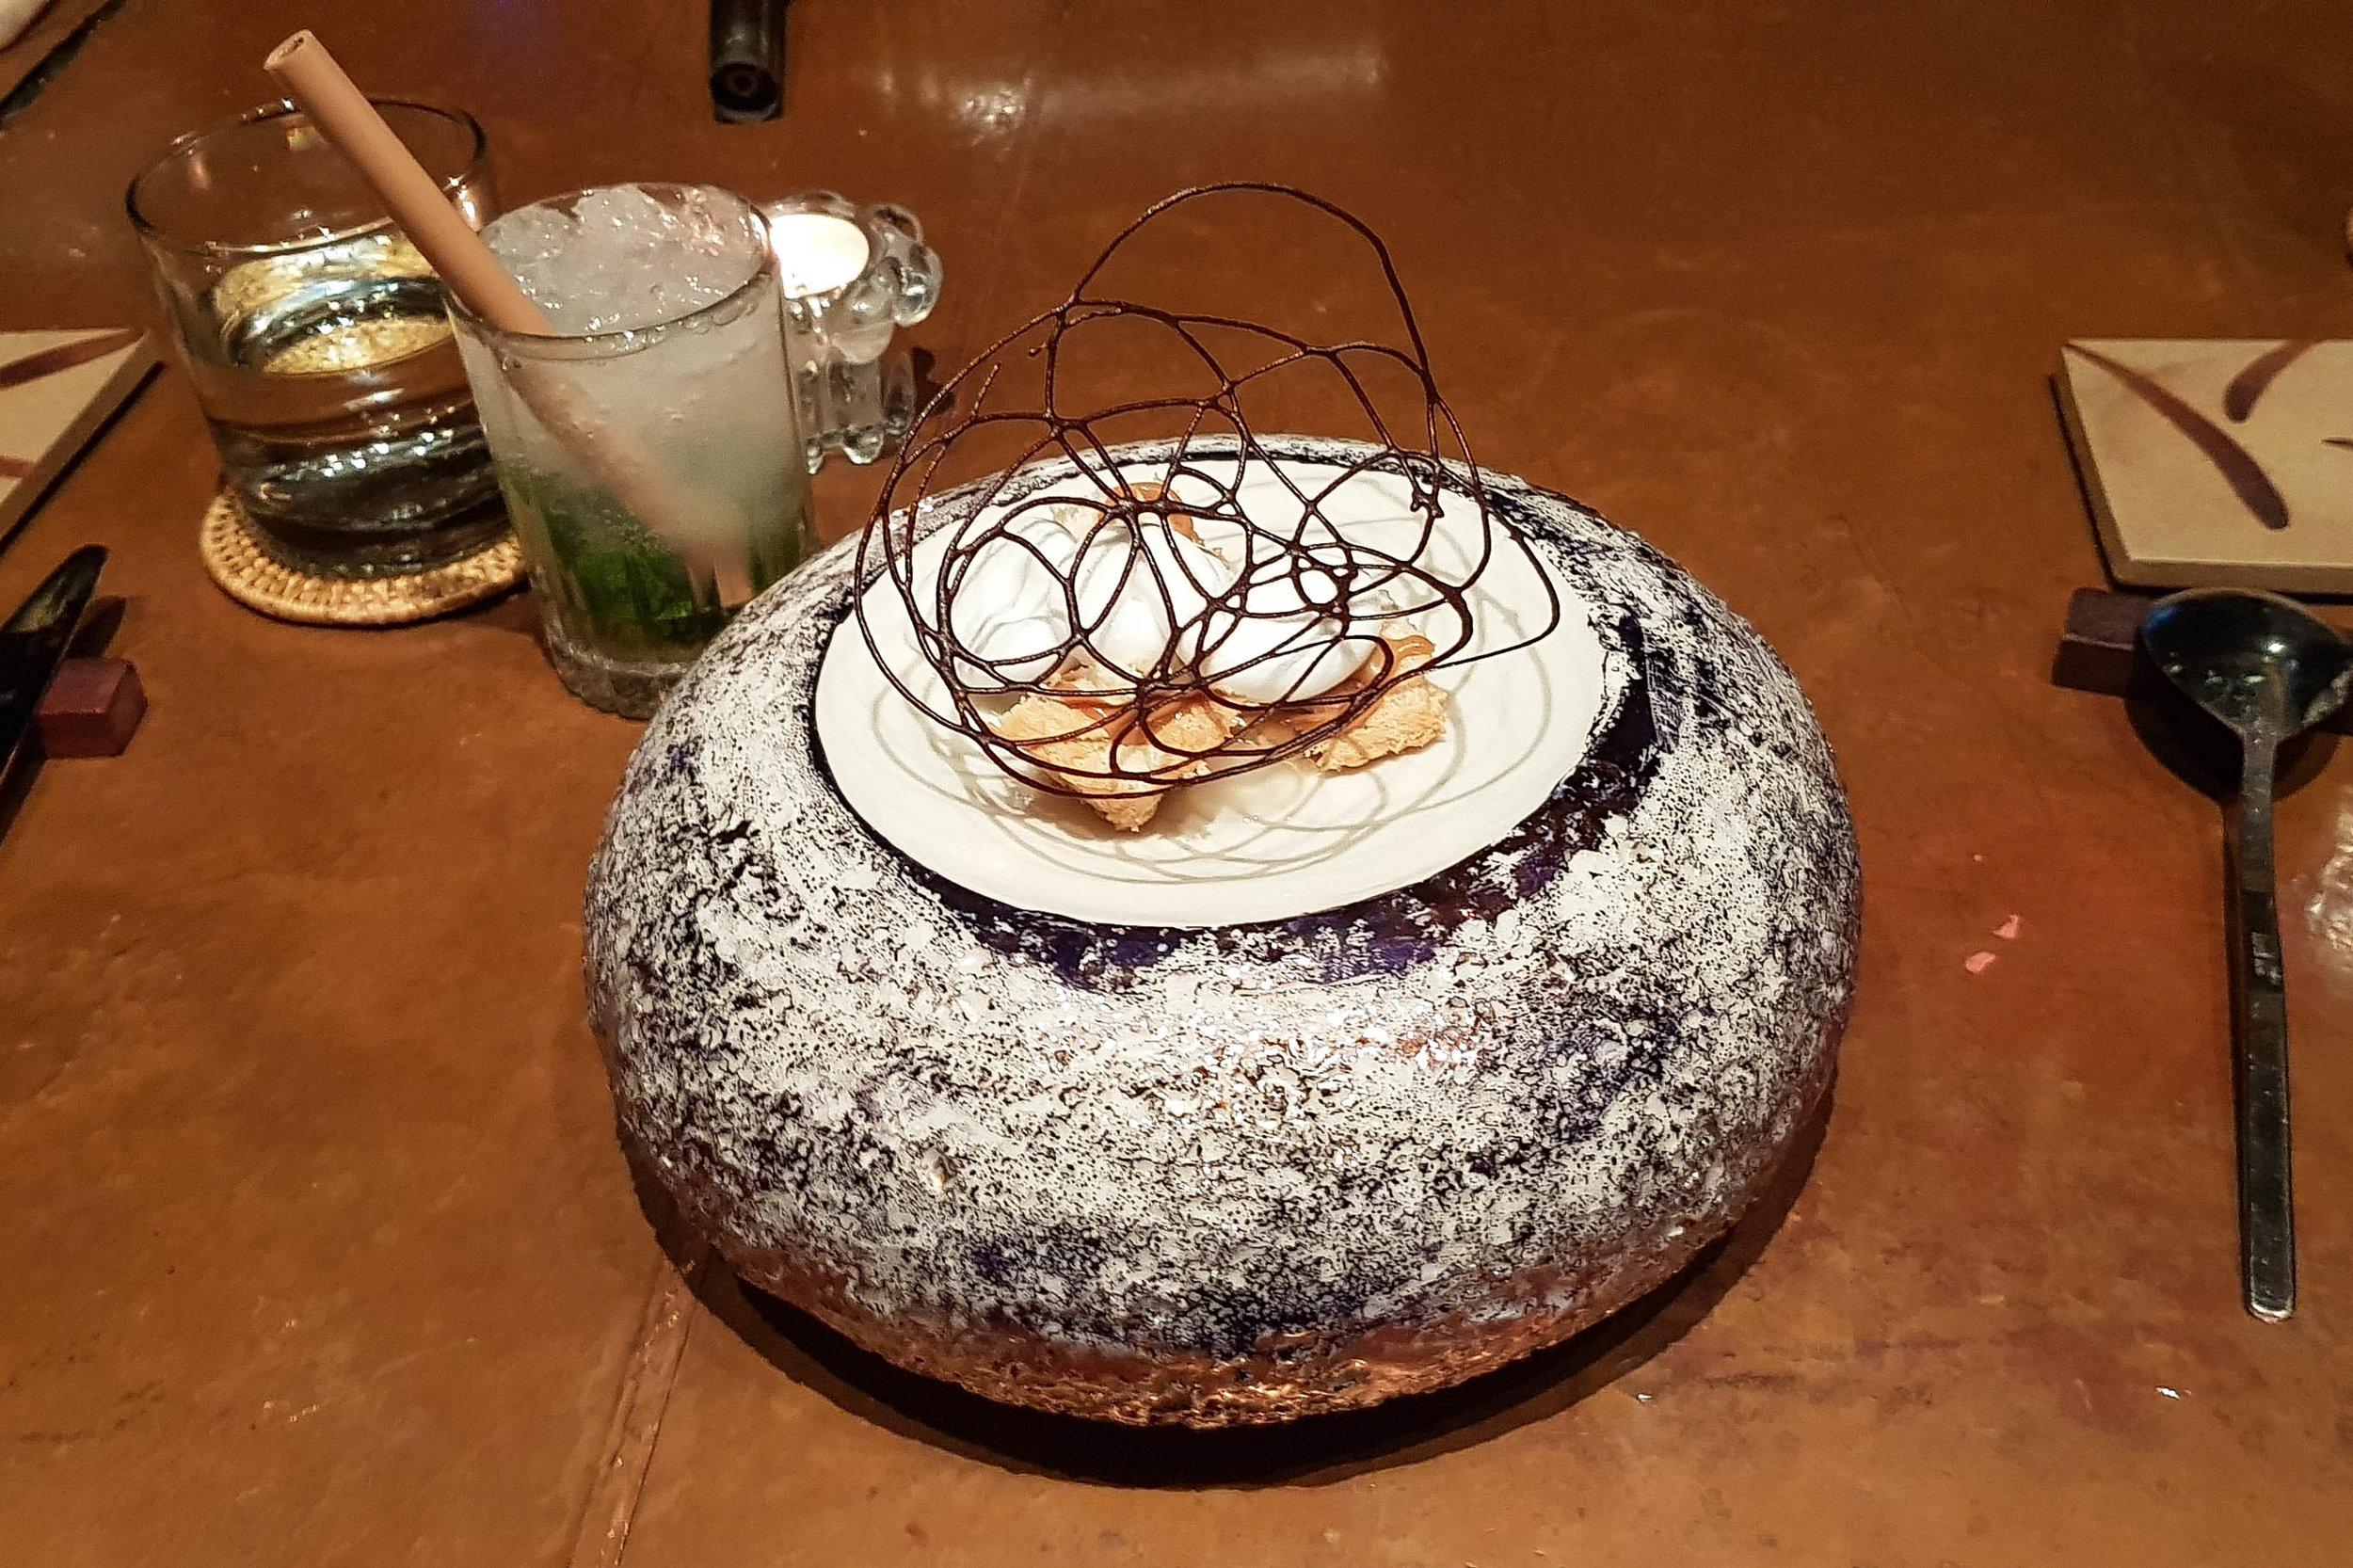 Incidente Stradale dish at Room 4 Dessert